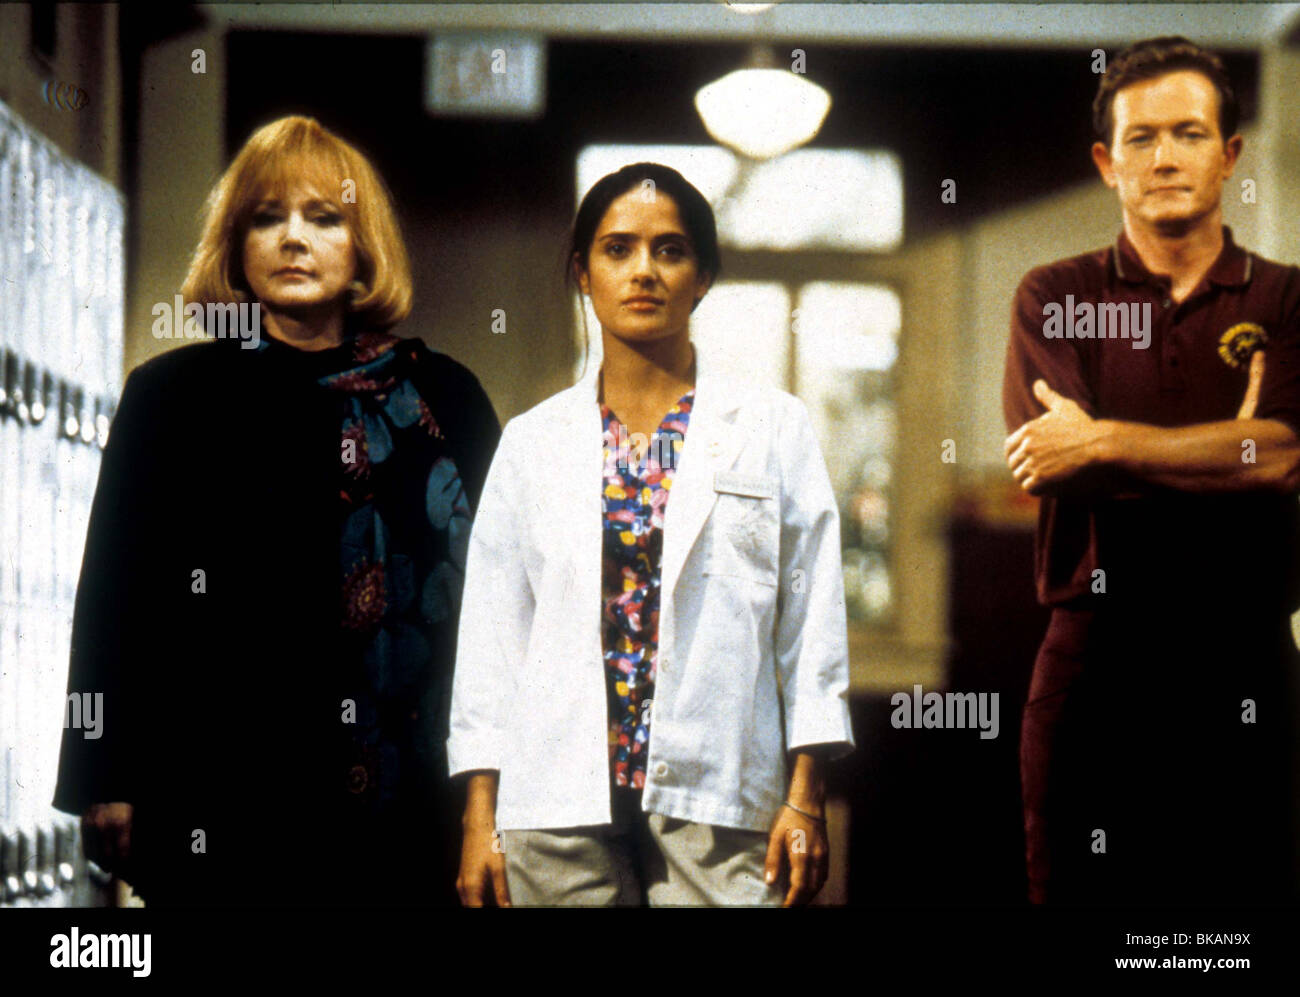 THE FACULTY (1999) PIPER LAURIE, SALMA HAYEK, ROBERT PATRICK FACU 001 - Stock Image